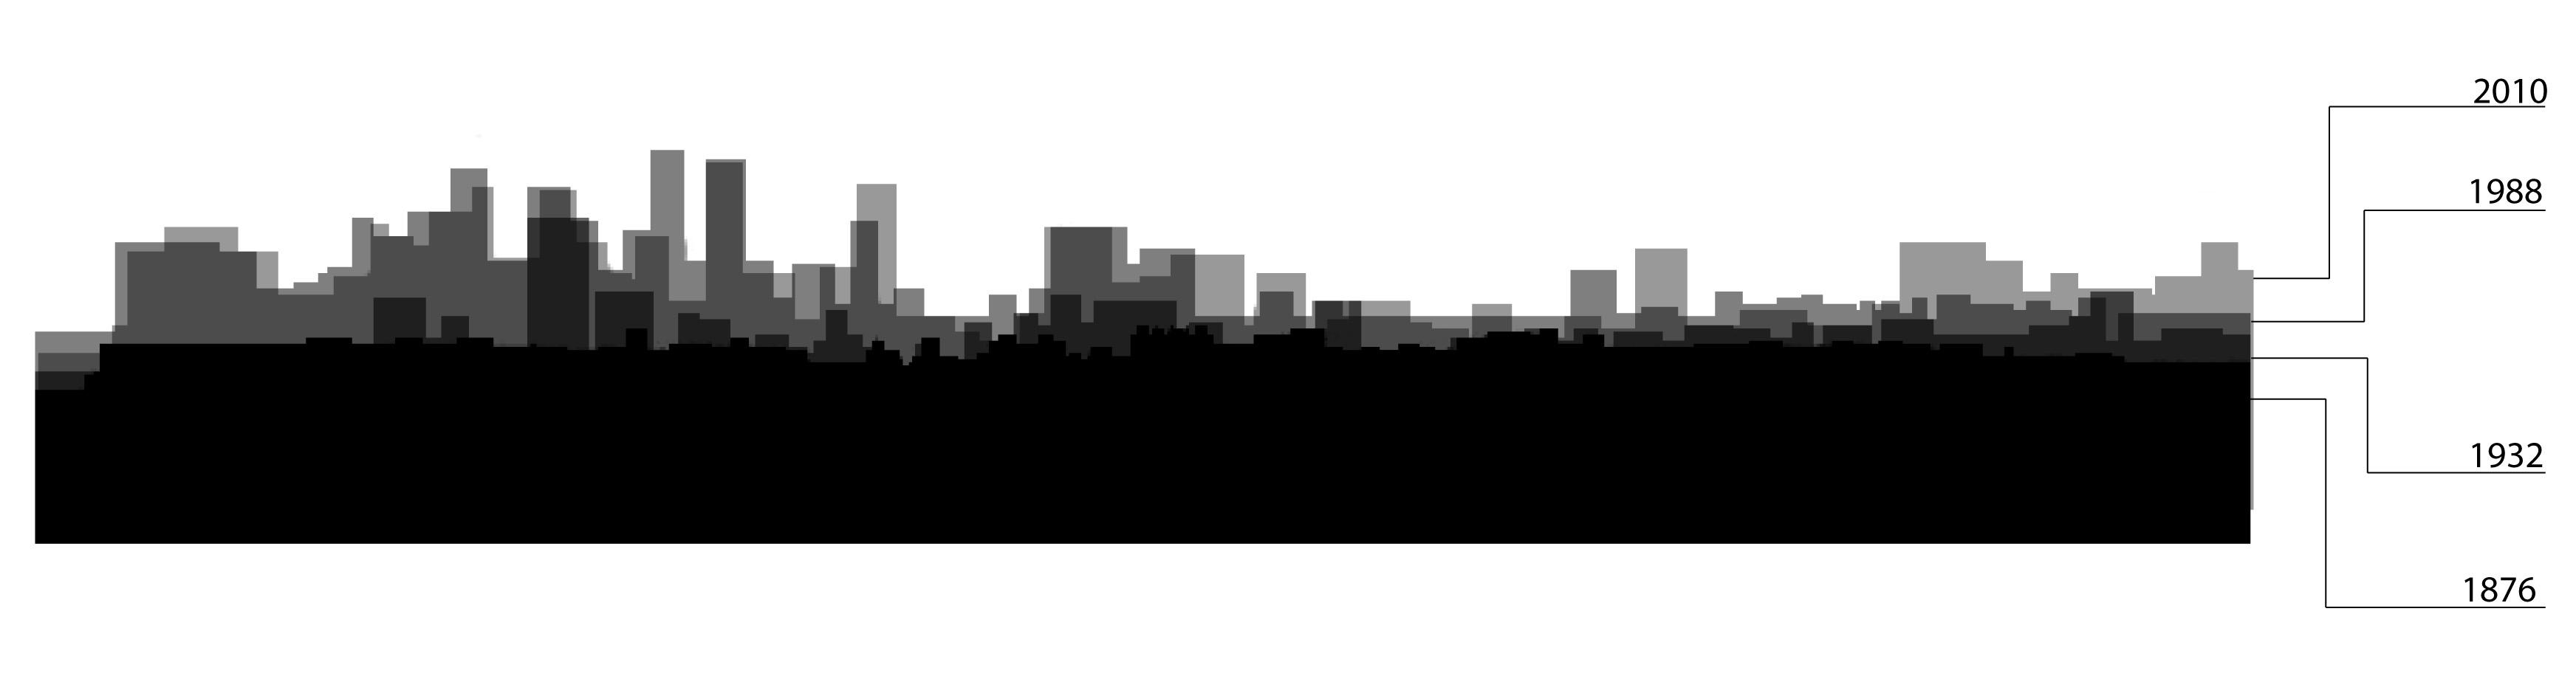 3488x920 Cityscape Clipart Urban Development ~ Frames ~ Illustrations ~ Hd